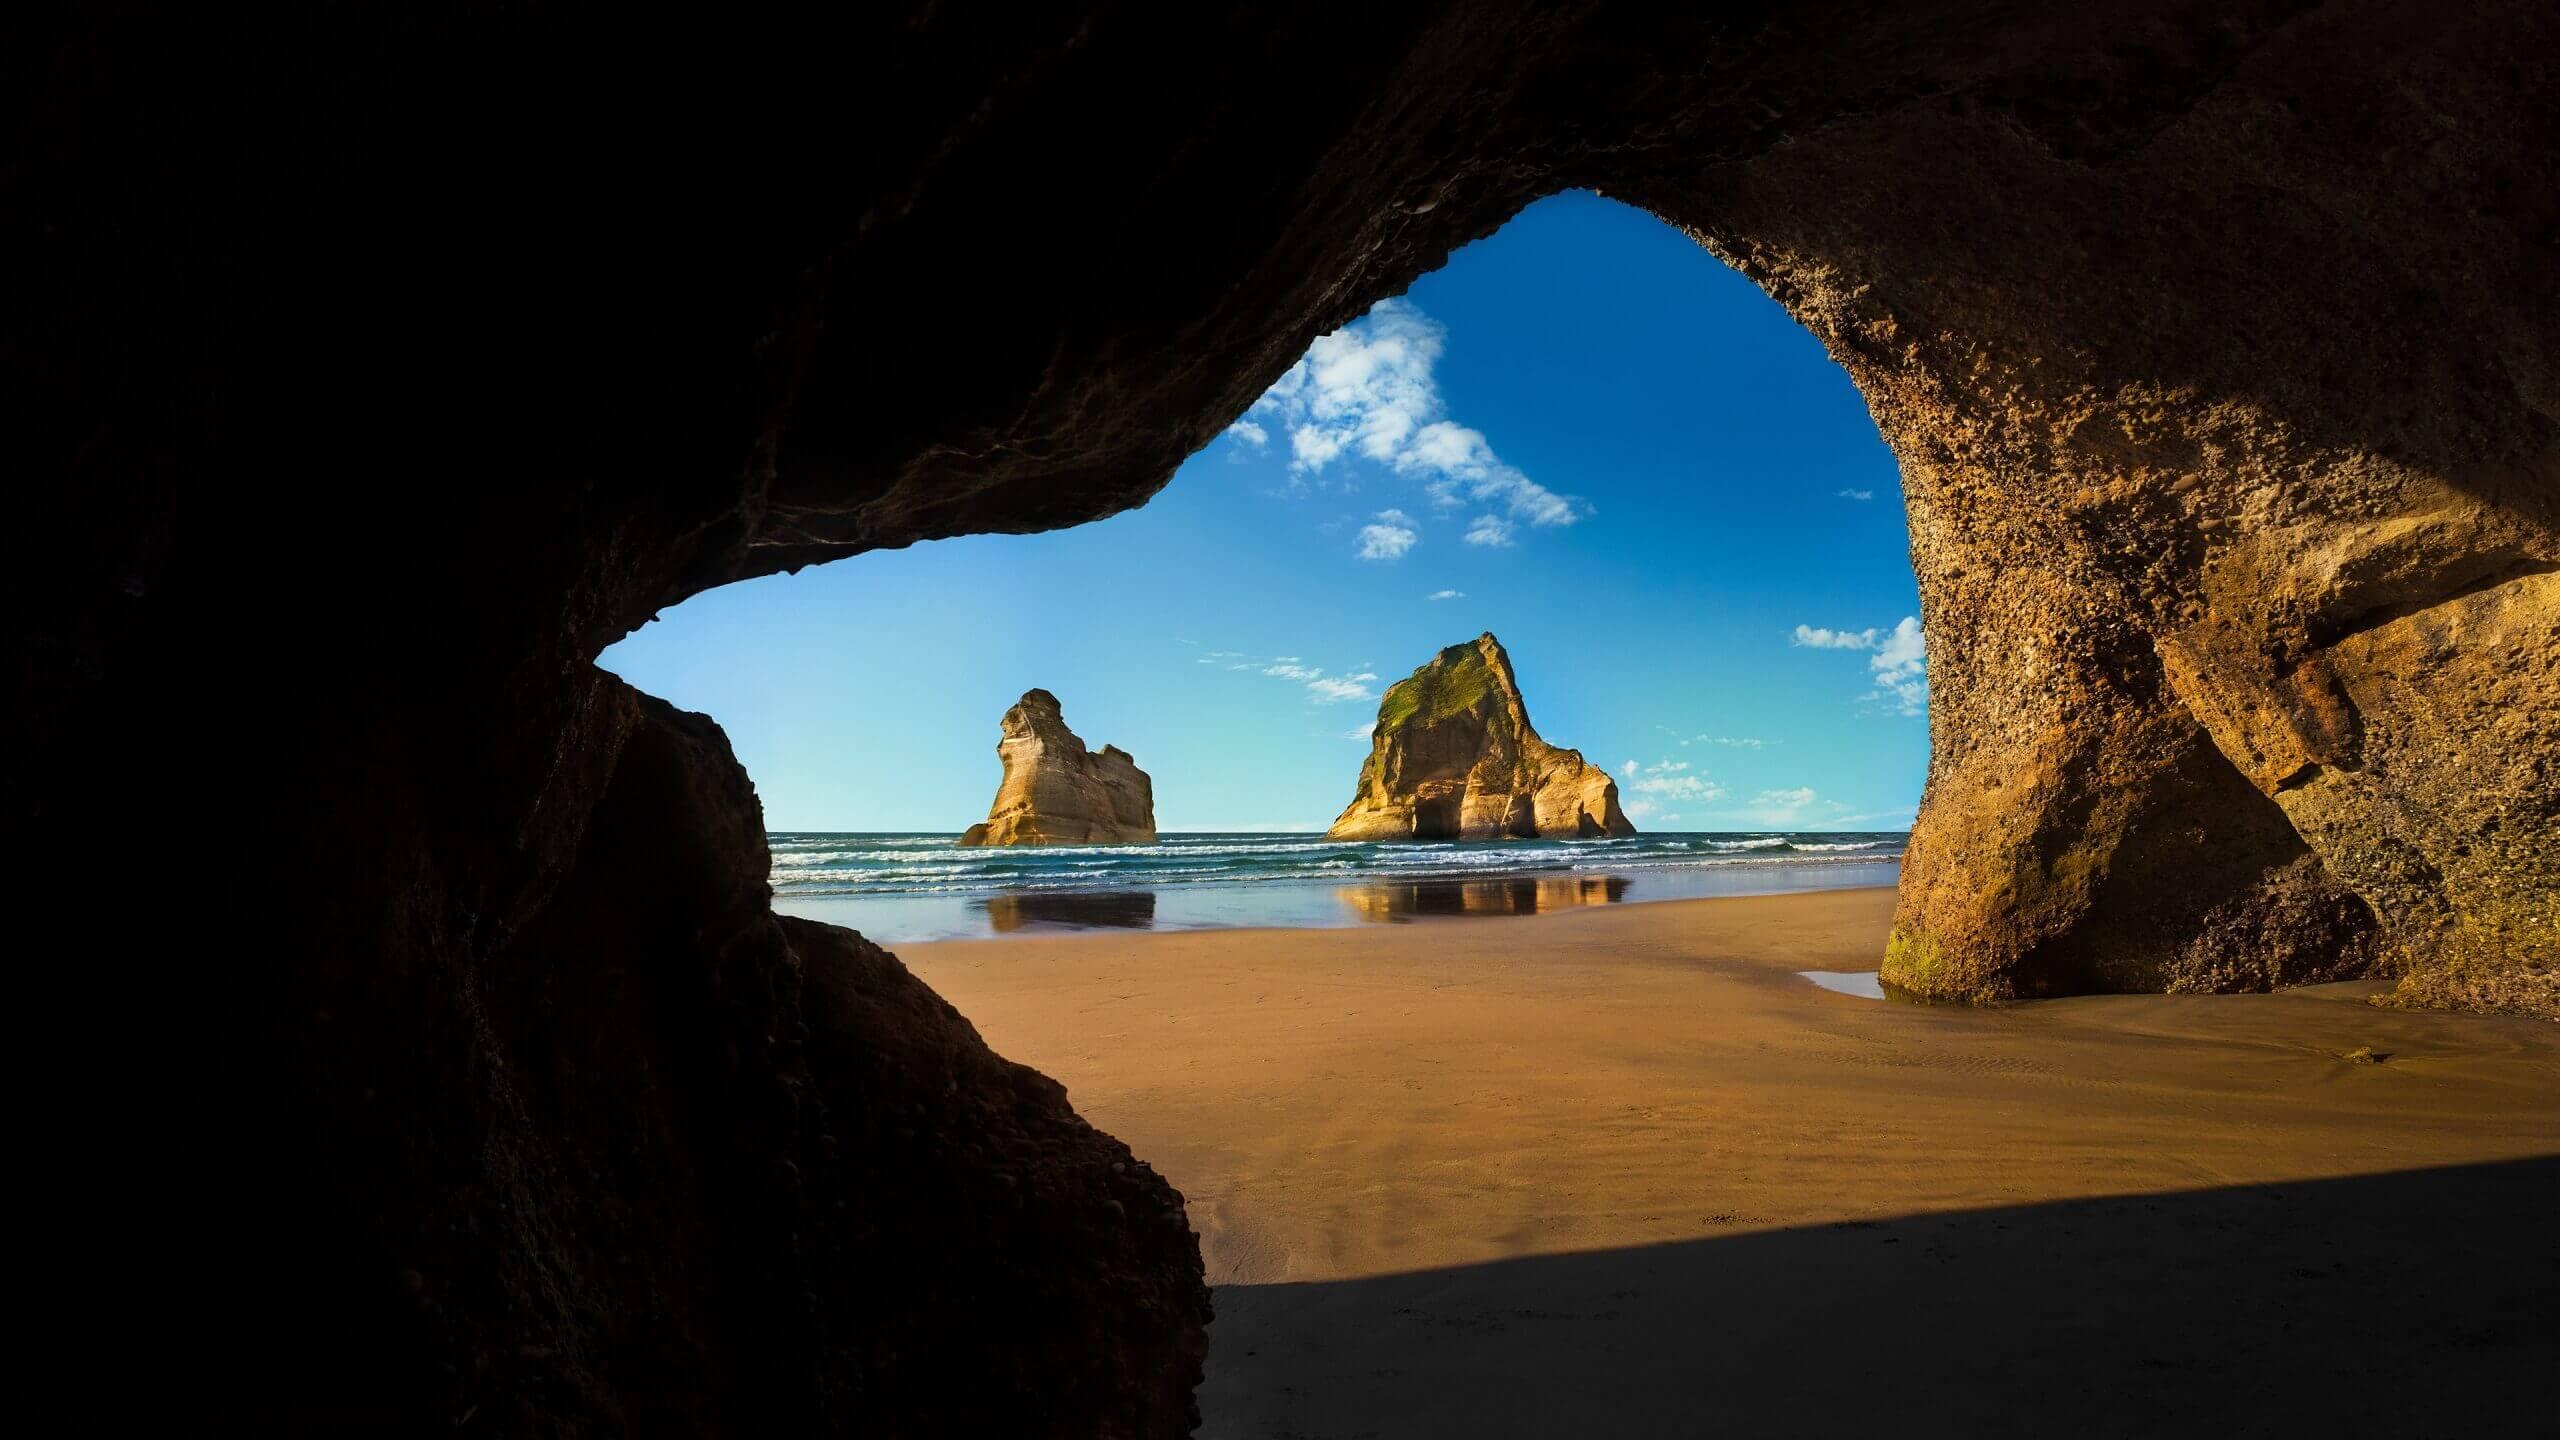 Windows 10 Spotlight Images Wharariki Beach Cave Archway Islands South Island of New Zealand